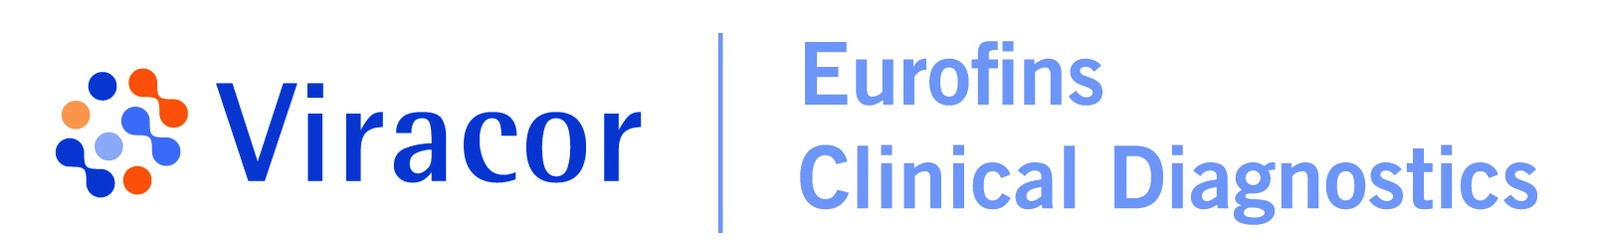 Viracor_Eurofins Clinical Diagnostics